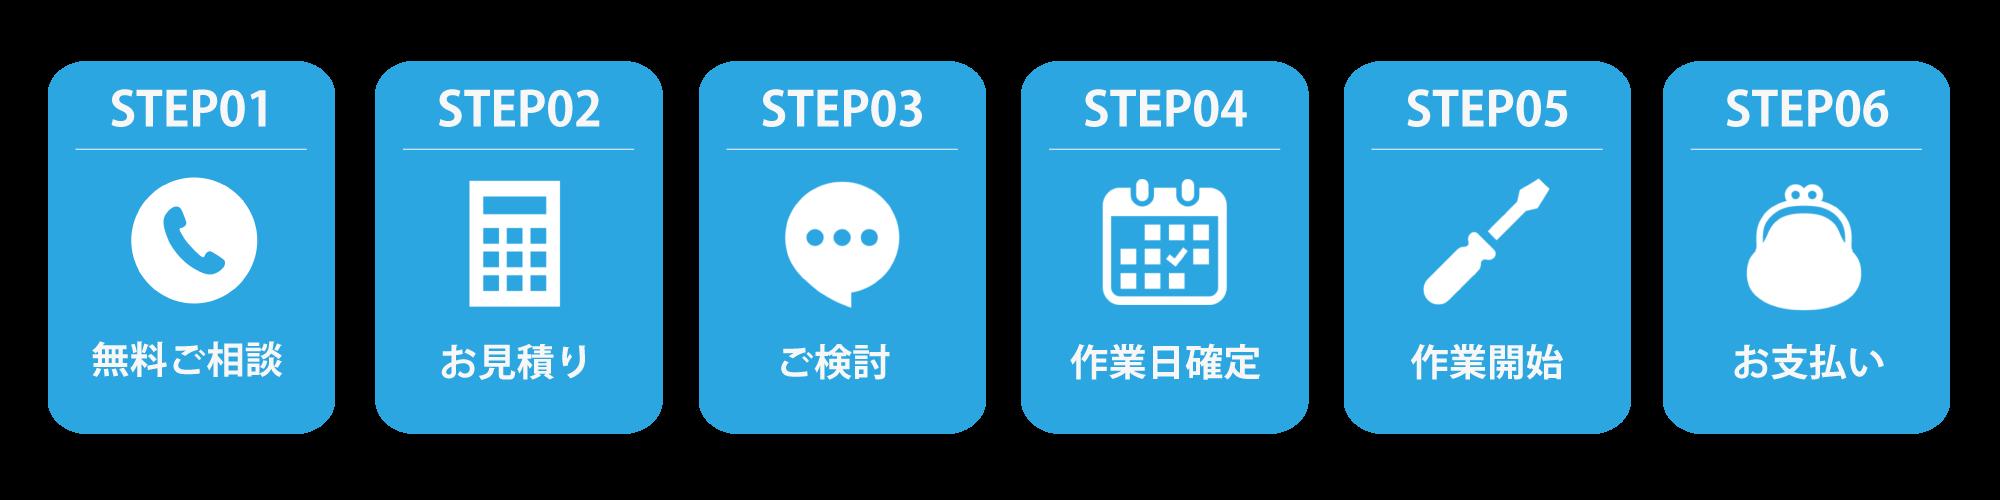 STEP01 無料ご相談・STEP02 お見積り・STEP03 ご検討・STEP04 作業日確定・STEP05 作業開始・STEP06 お支払い